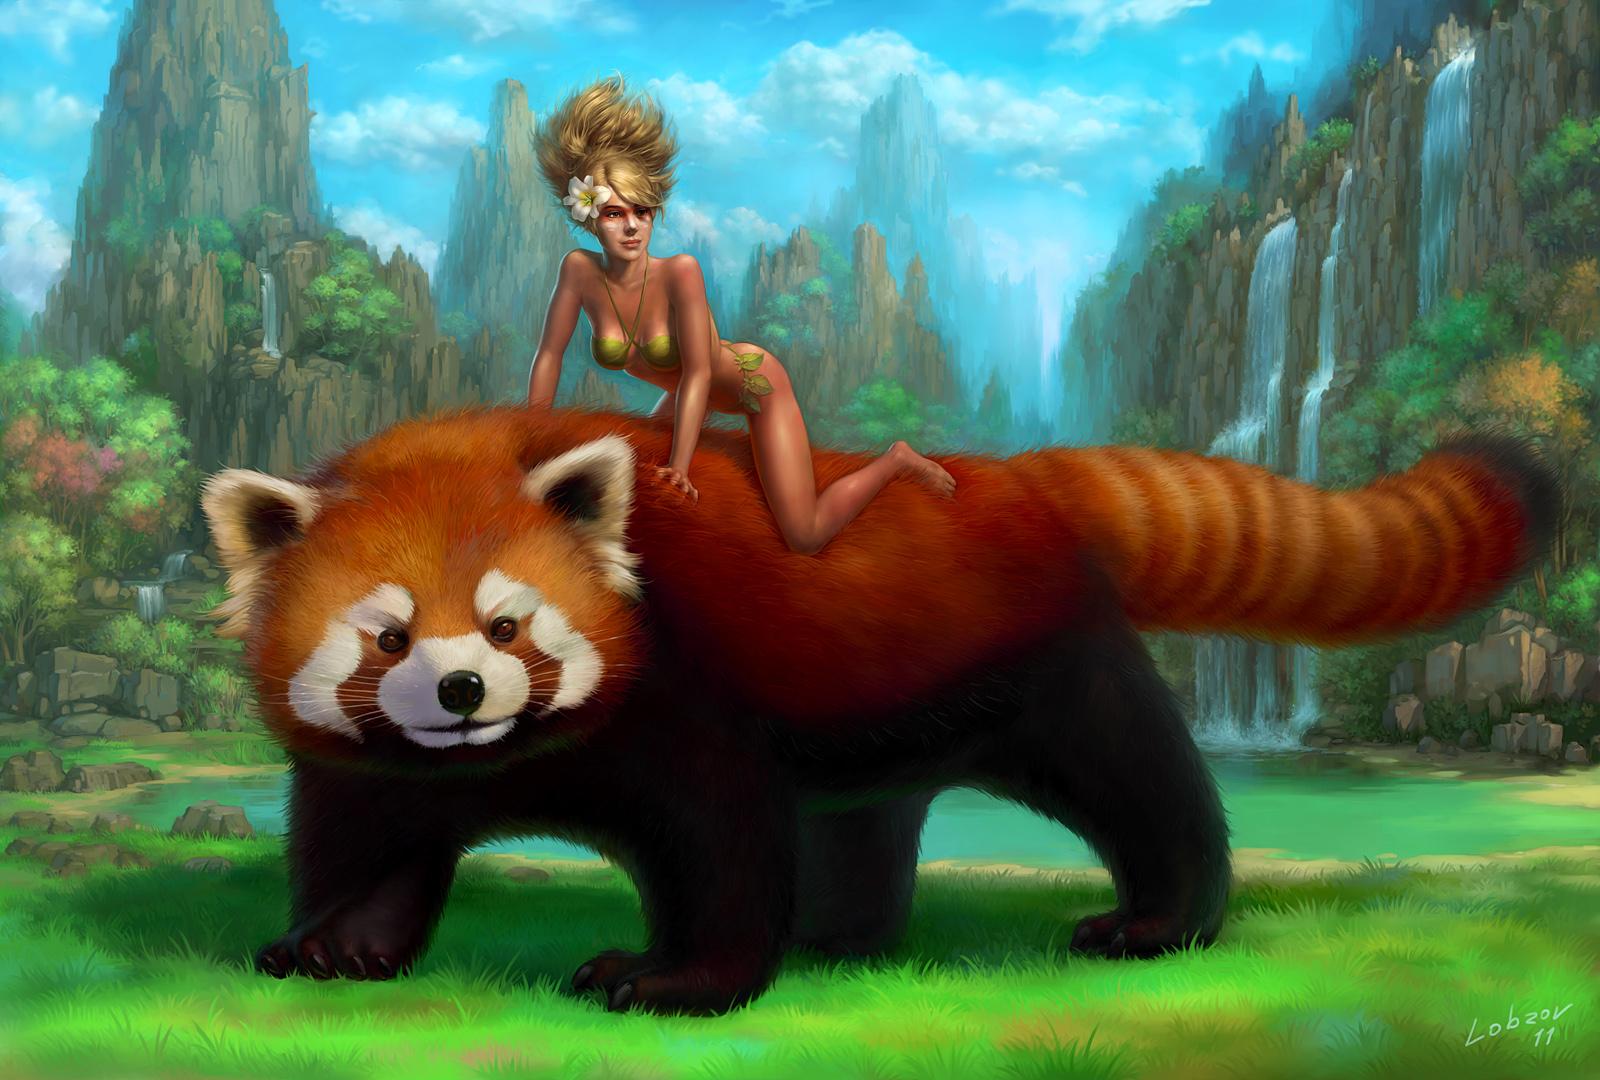 Drawn red panda china red Painting Panda Red painting Red